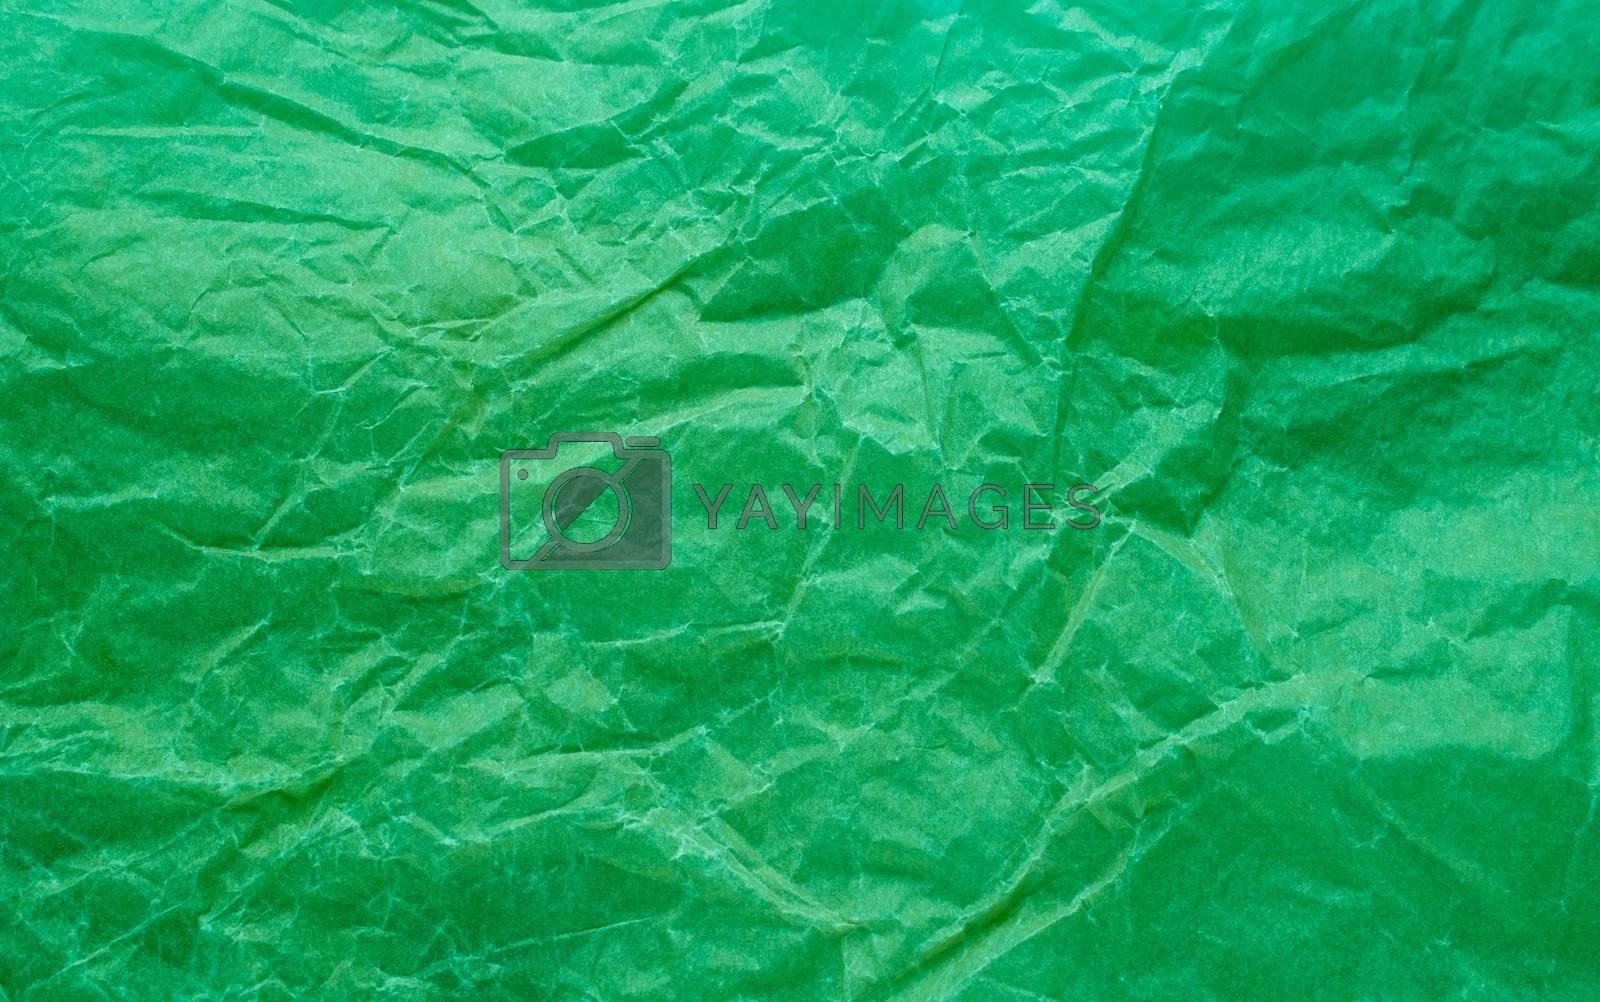 Rumpled paper texture green. Texture of crumpled paper. Crumpled paper. Wrinkles paper.